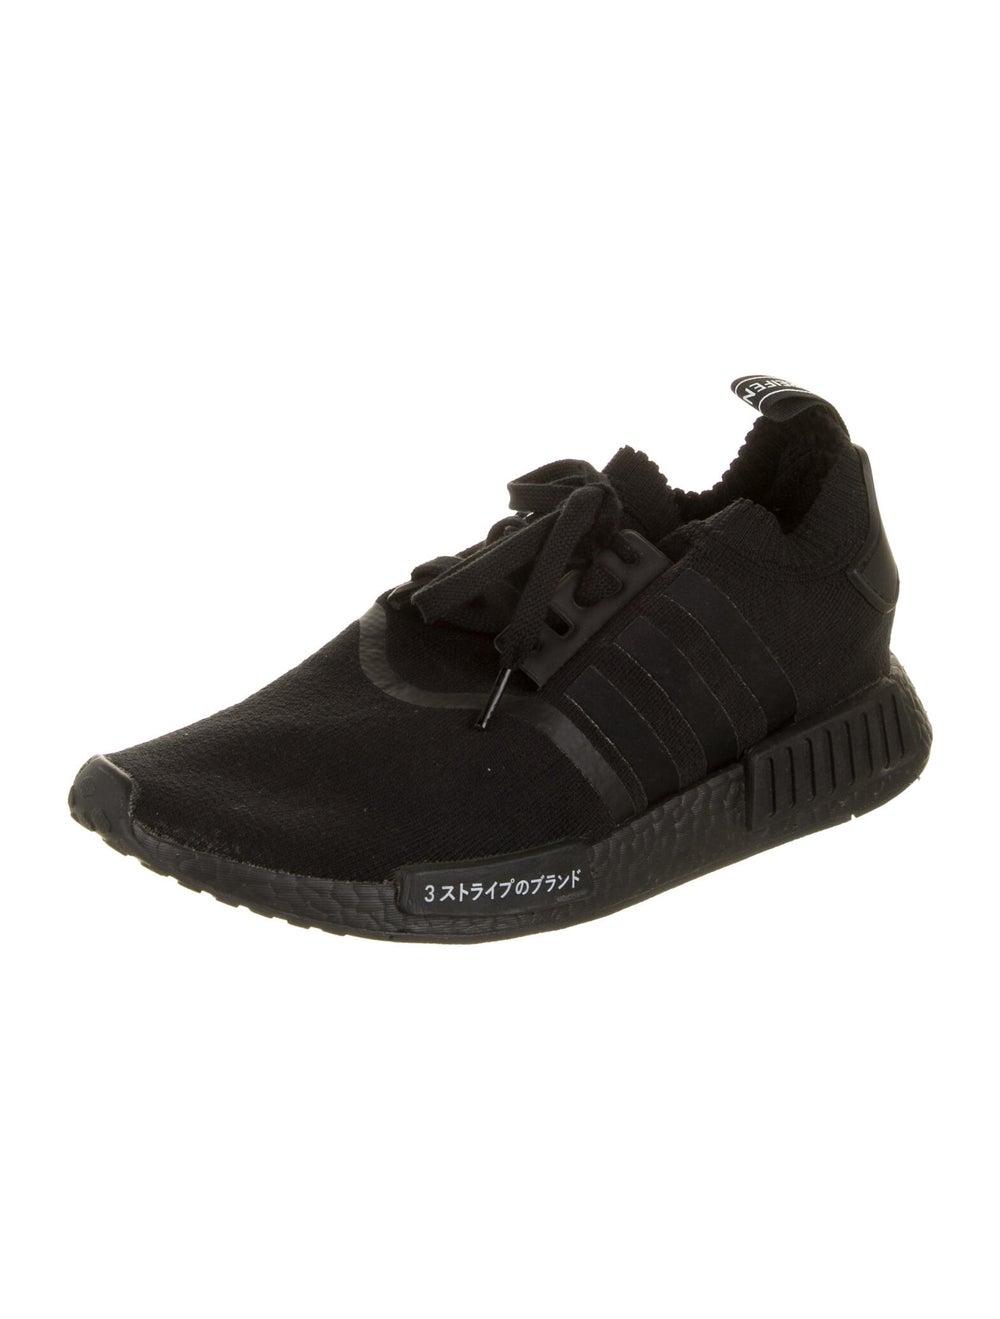 Adidas Athletic Sneakers Black - image 2